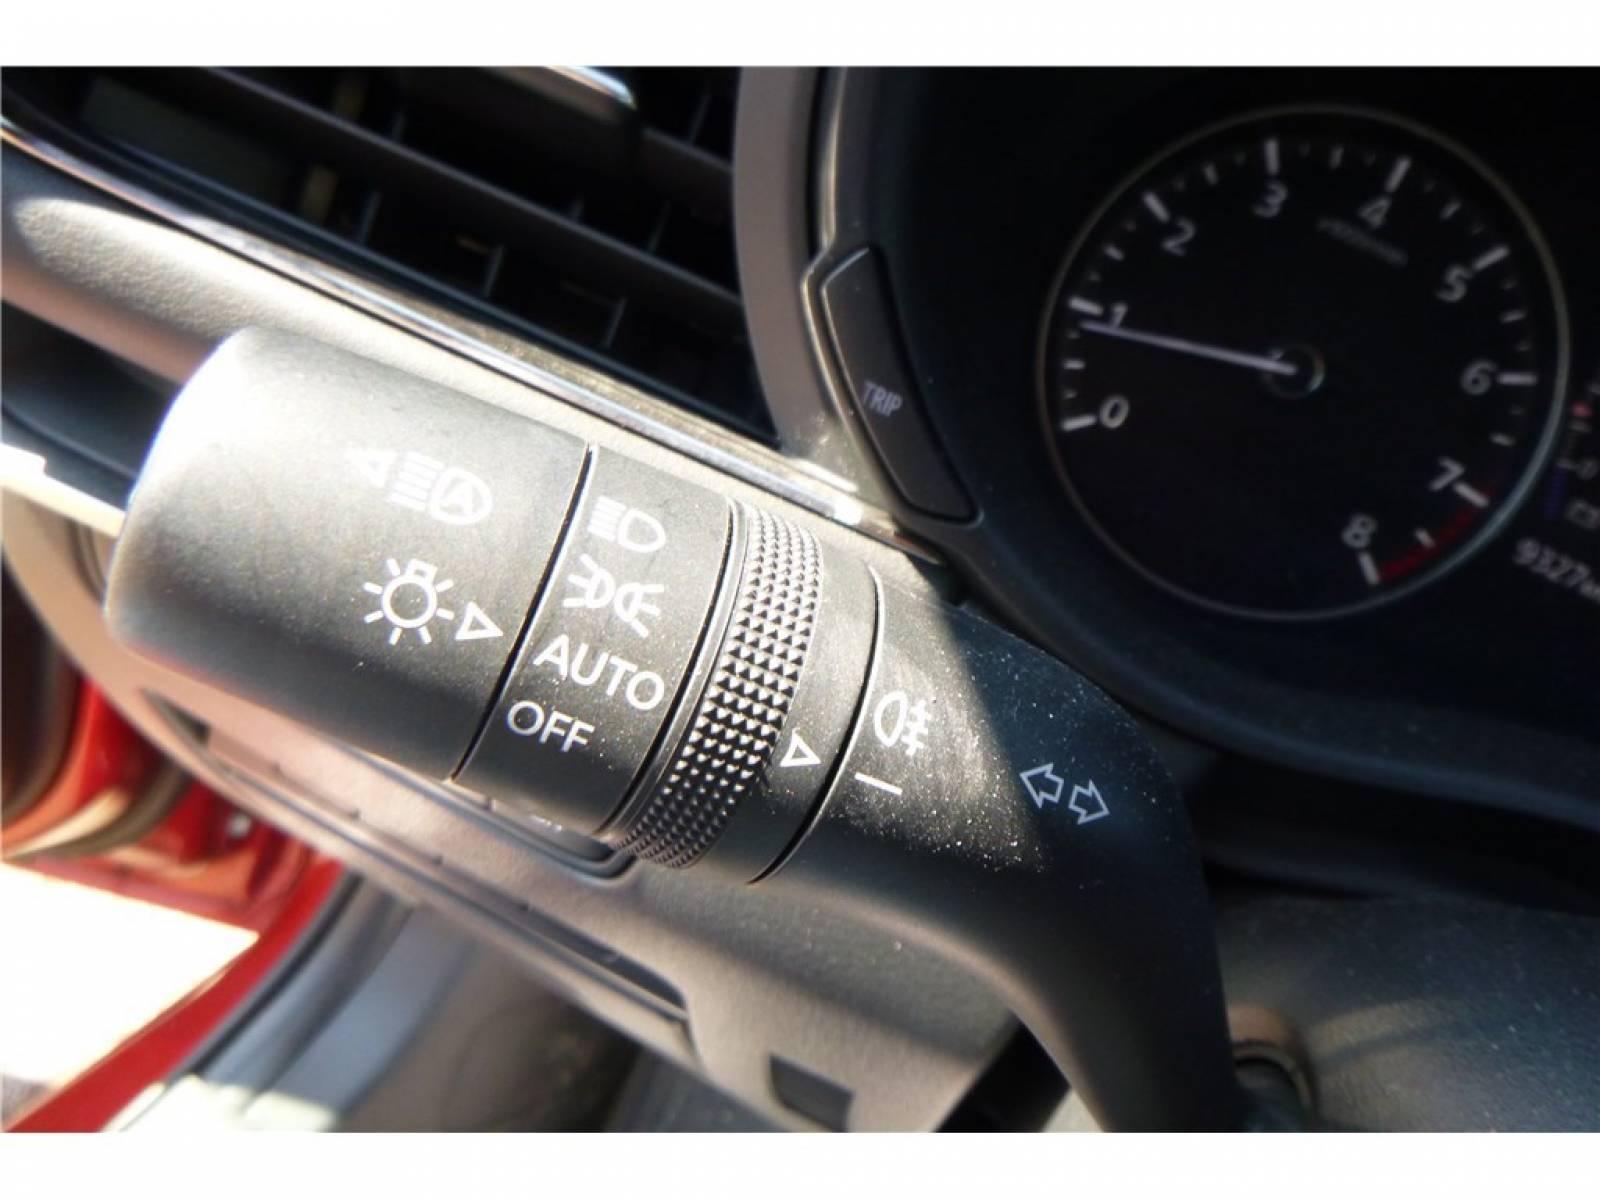 MAZDA Mazda3 5 portes 2.0L SKYACTIV-G M Hybrid 122 ch BVA6 - véhicule d'occasion - Groupe Guillet - Chalon Automobiles - 71100 - Chalon-sur-Saône - 18